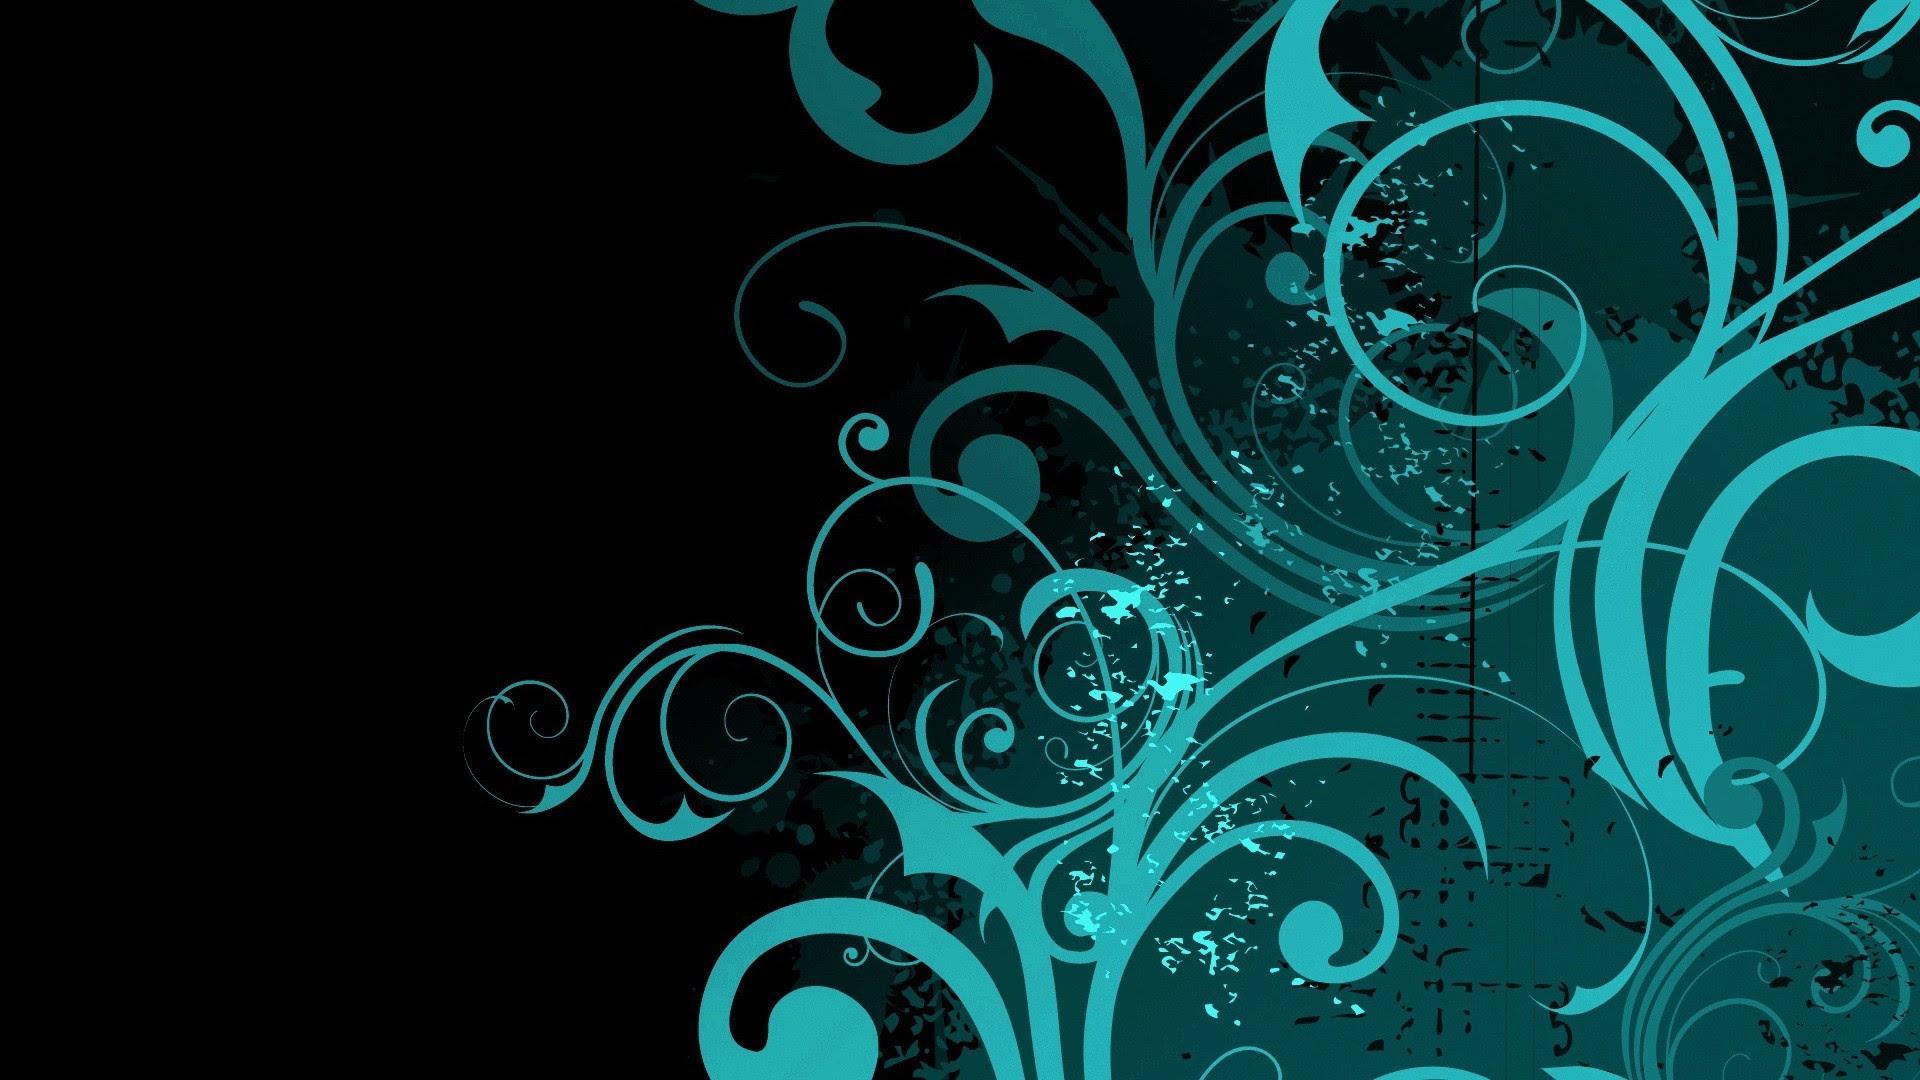 Swirl Wallpaper 1920x1080 74320